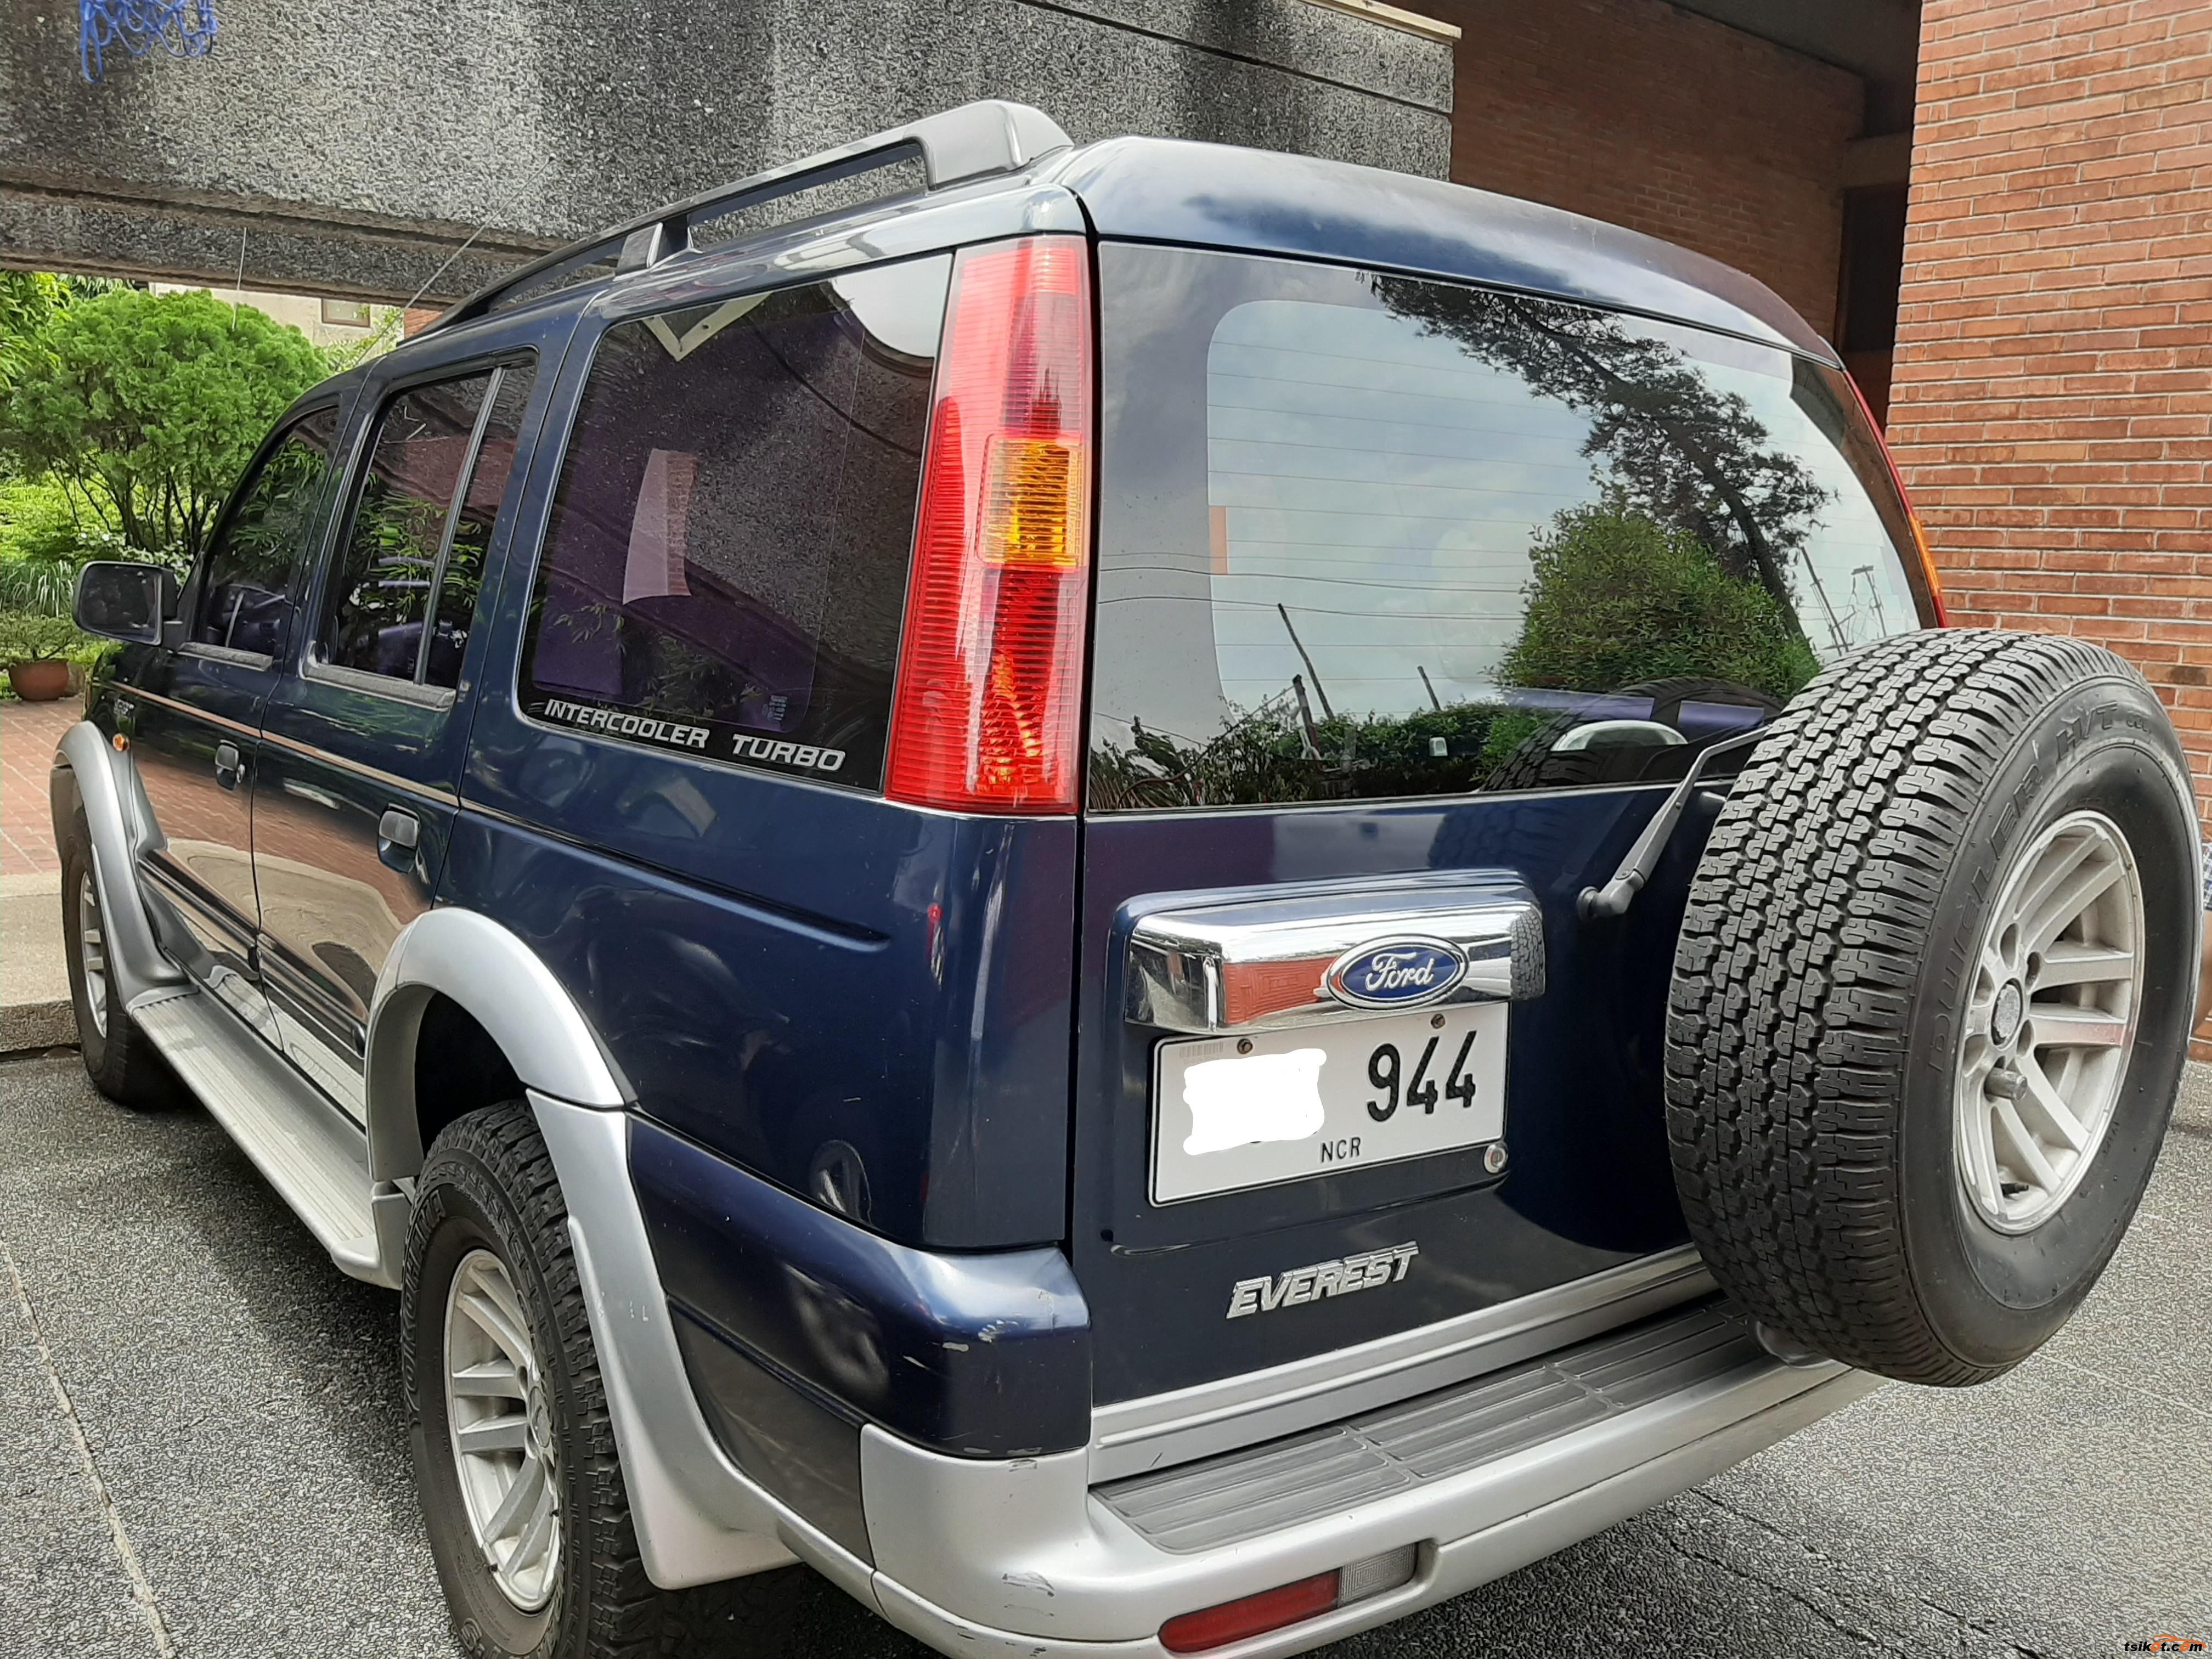 Ford Everest 2003 - 10